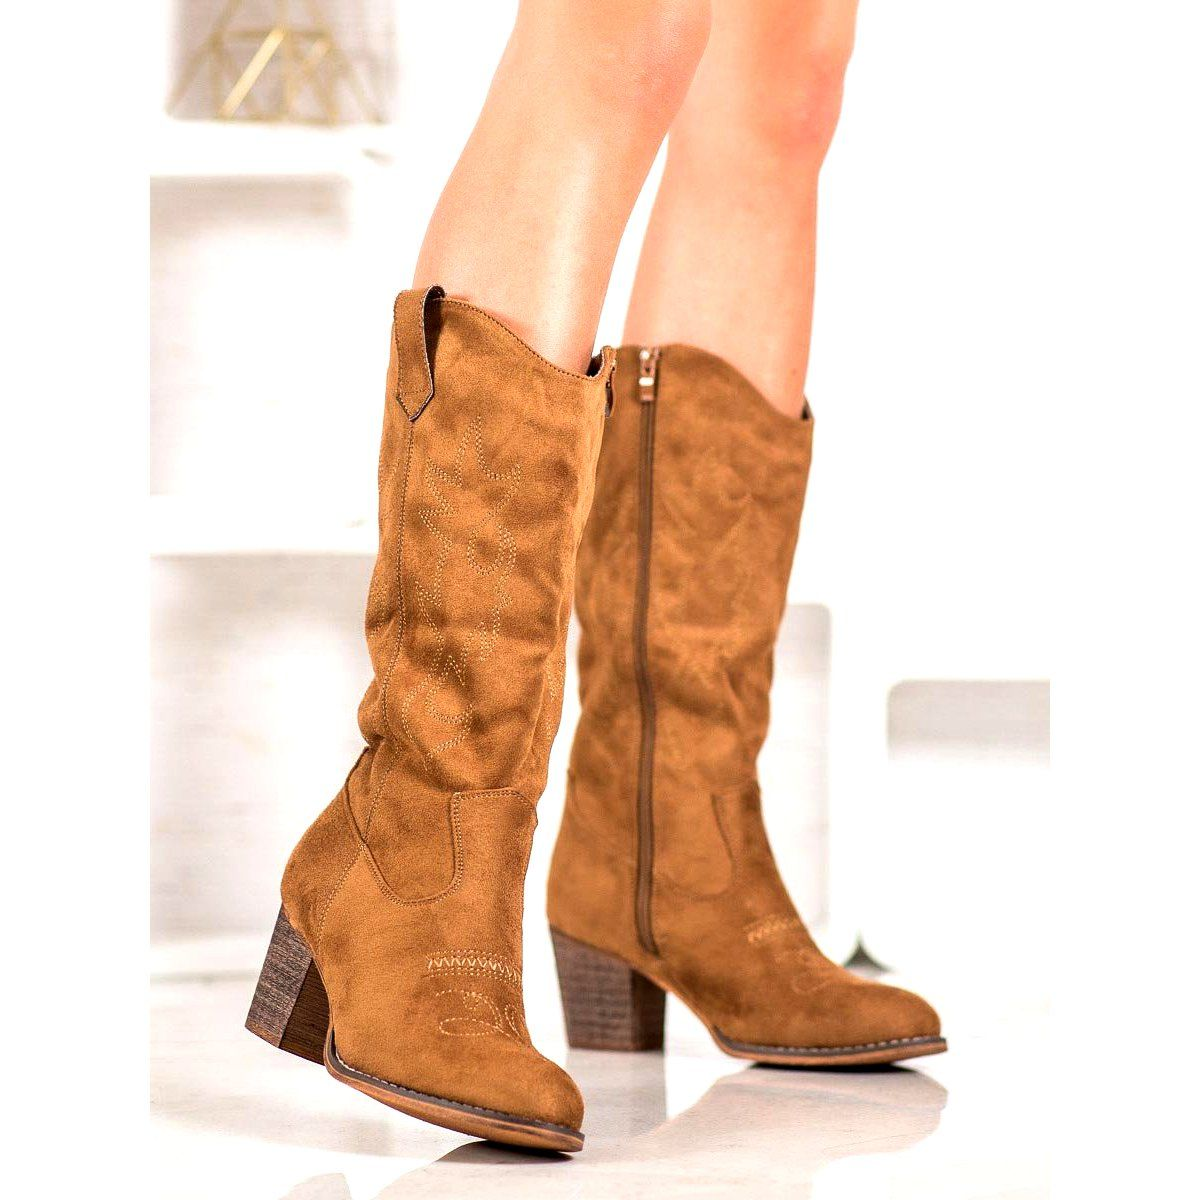 Abloom Kozaki Kowbojki Brazowe Boots Shoes Riding Boots